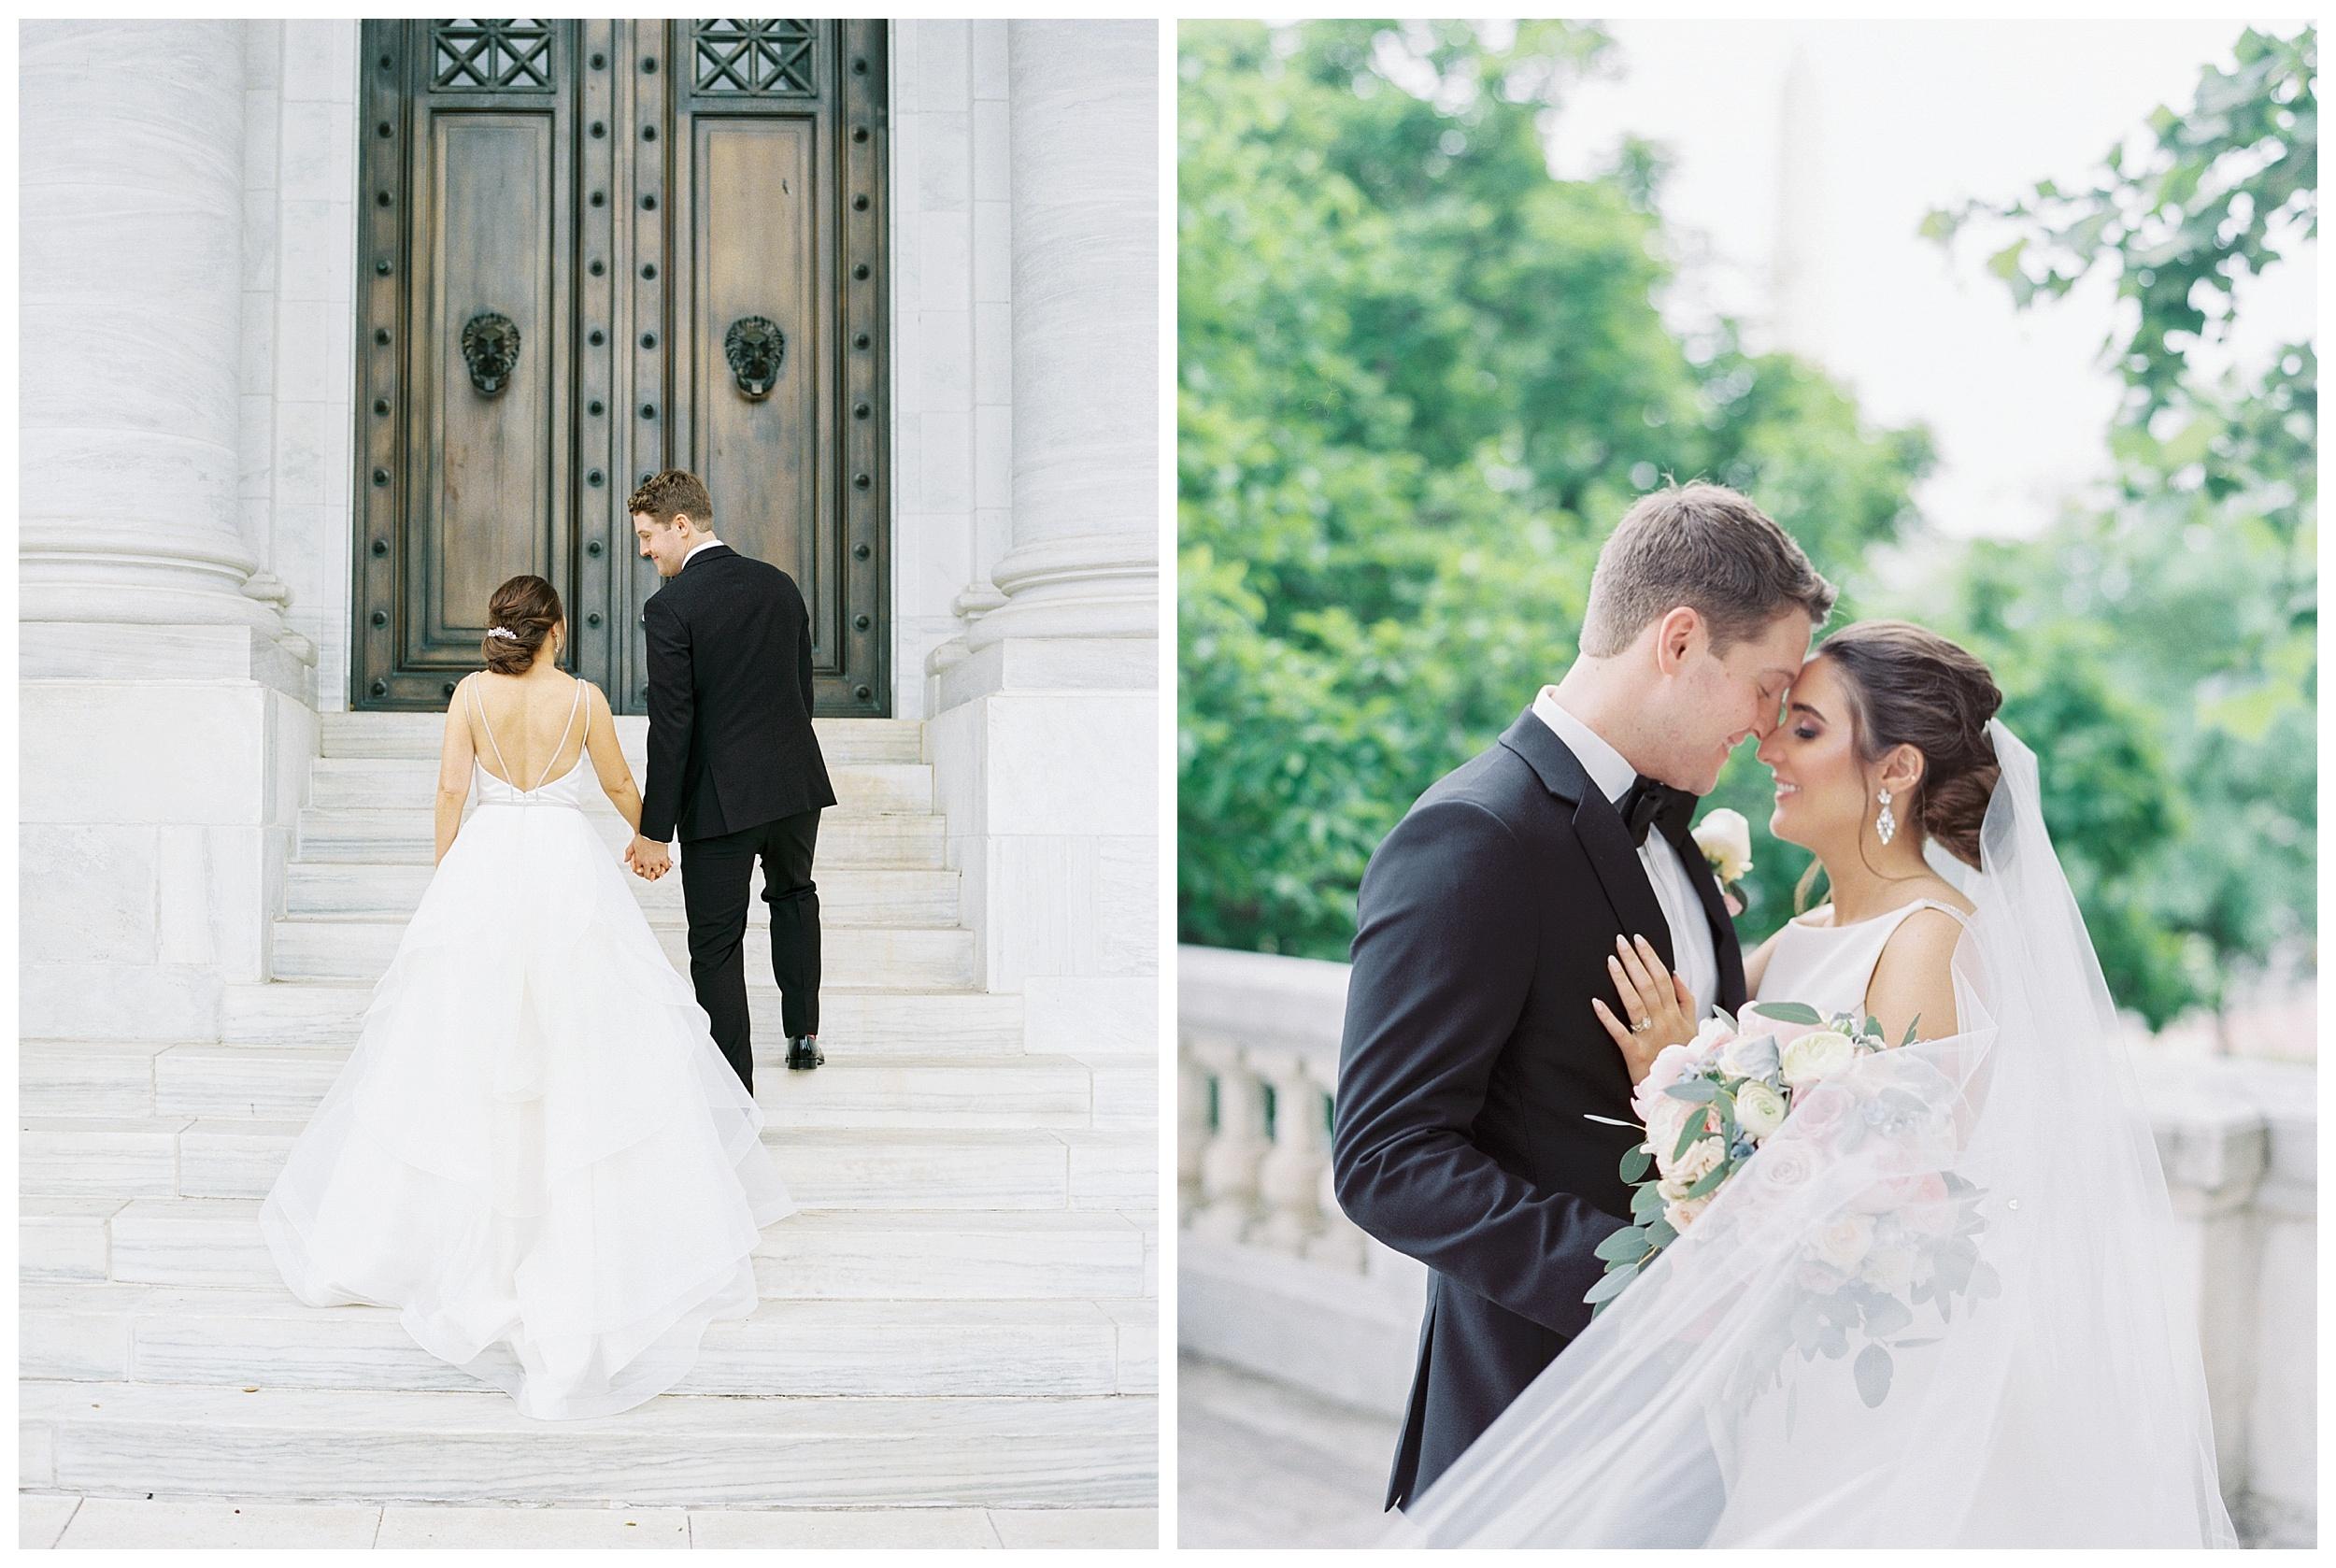 DAR Constitution Hall Wedding Wedding | Daughters of the American Revolution Wedding | District of Columbia Film Wedding Photographer Kir Tuben_0112.jpg